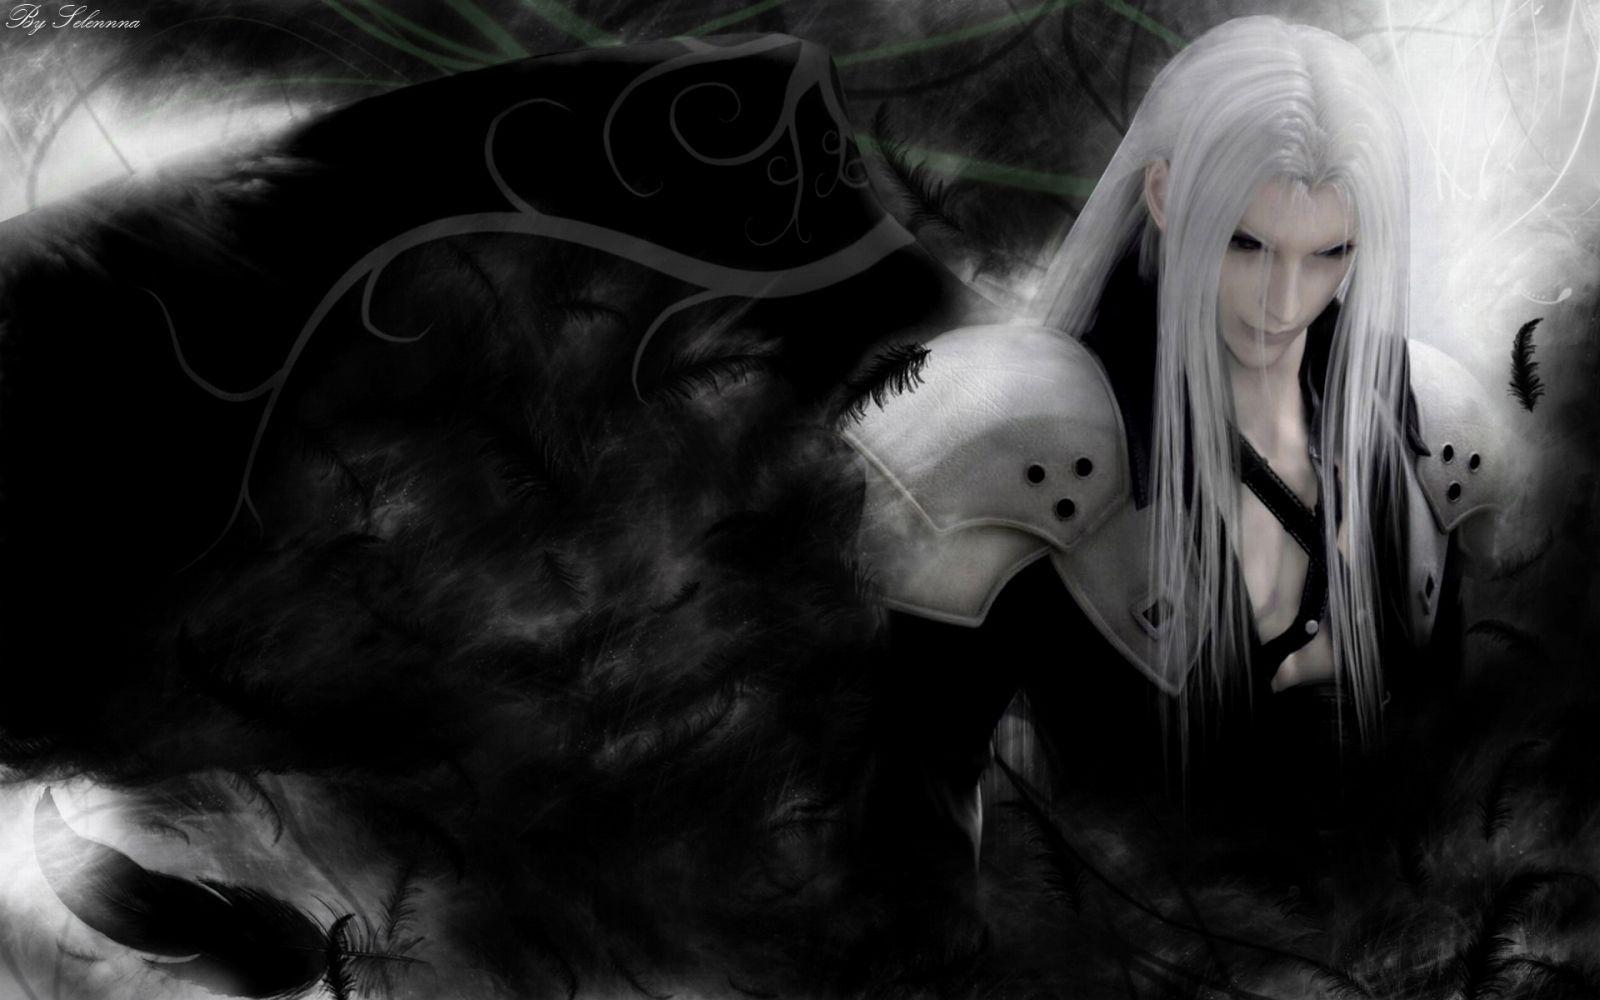 Sephiroth Wallpaper ファイナルファンタジー ファイナル